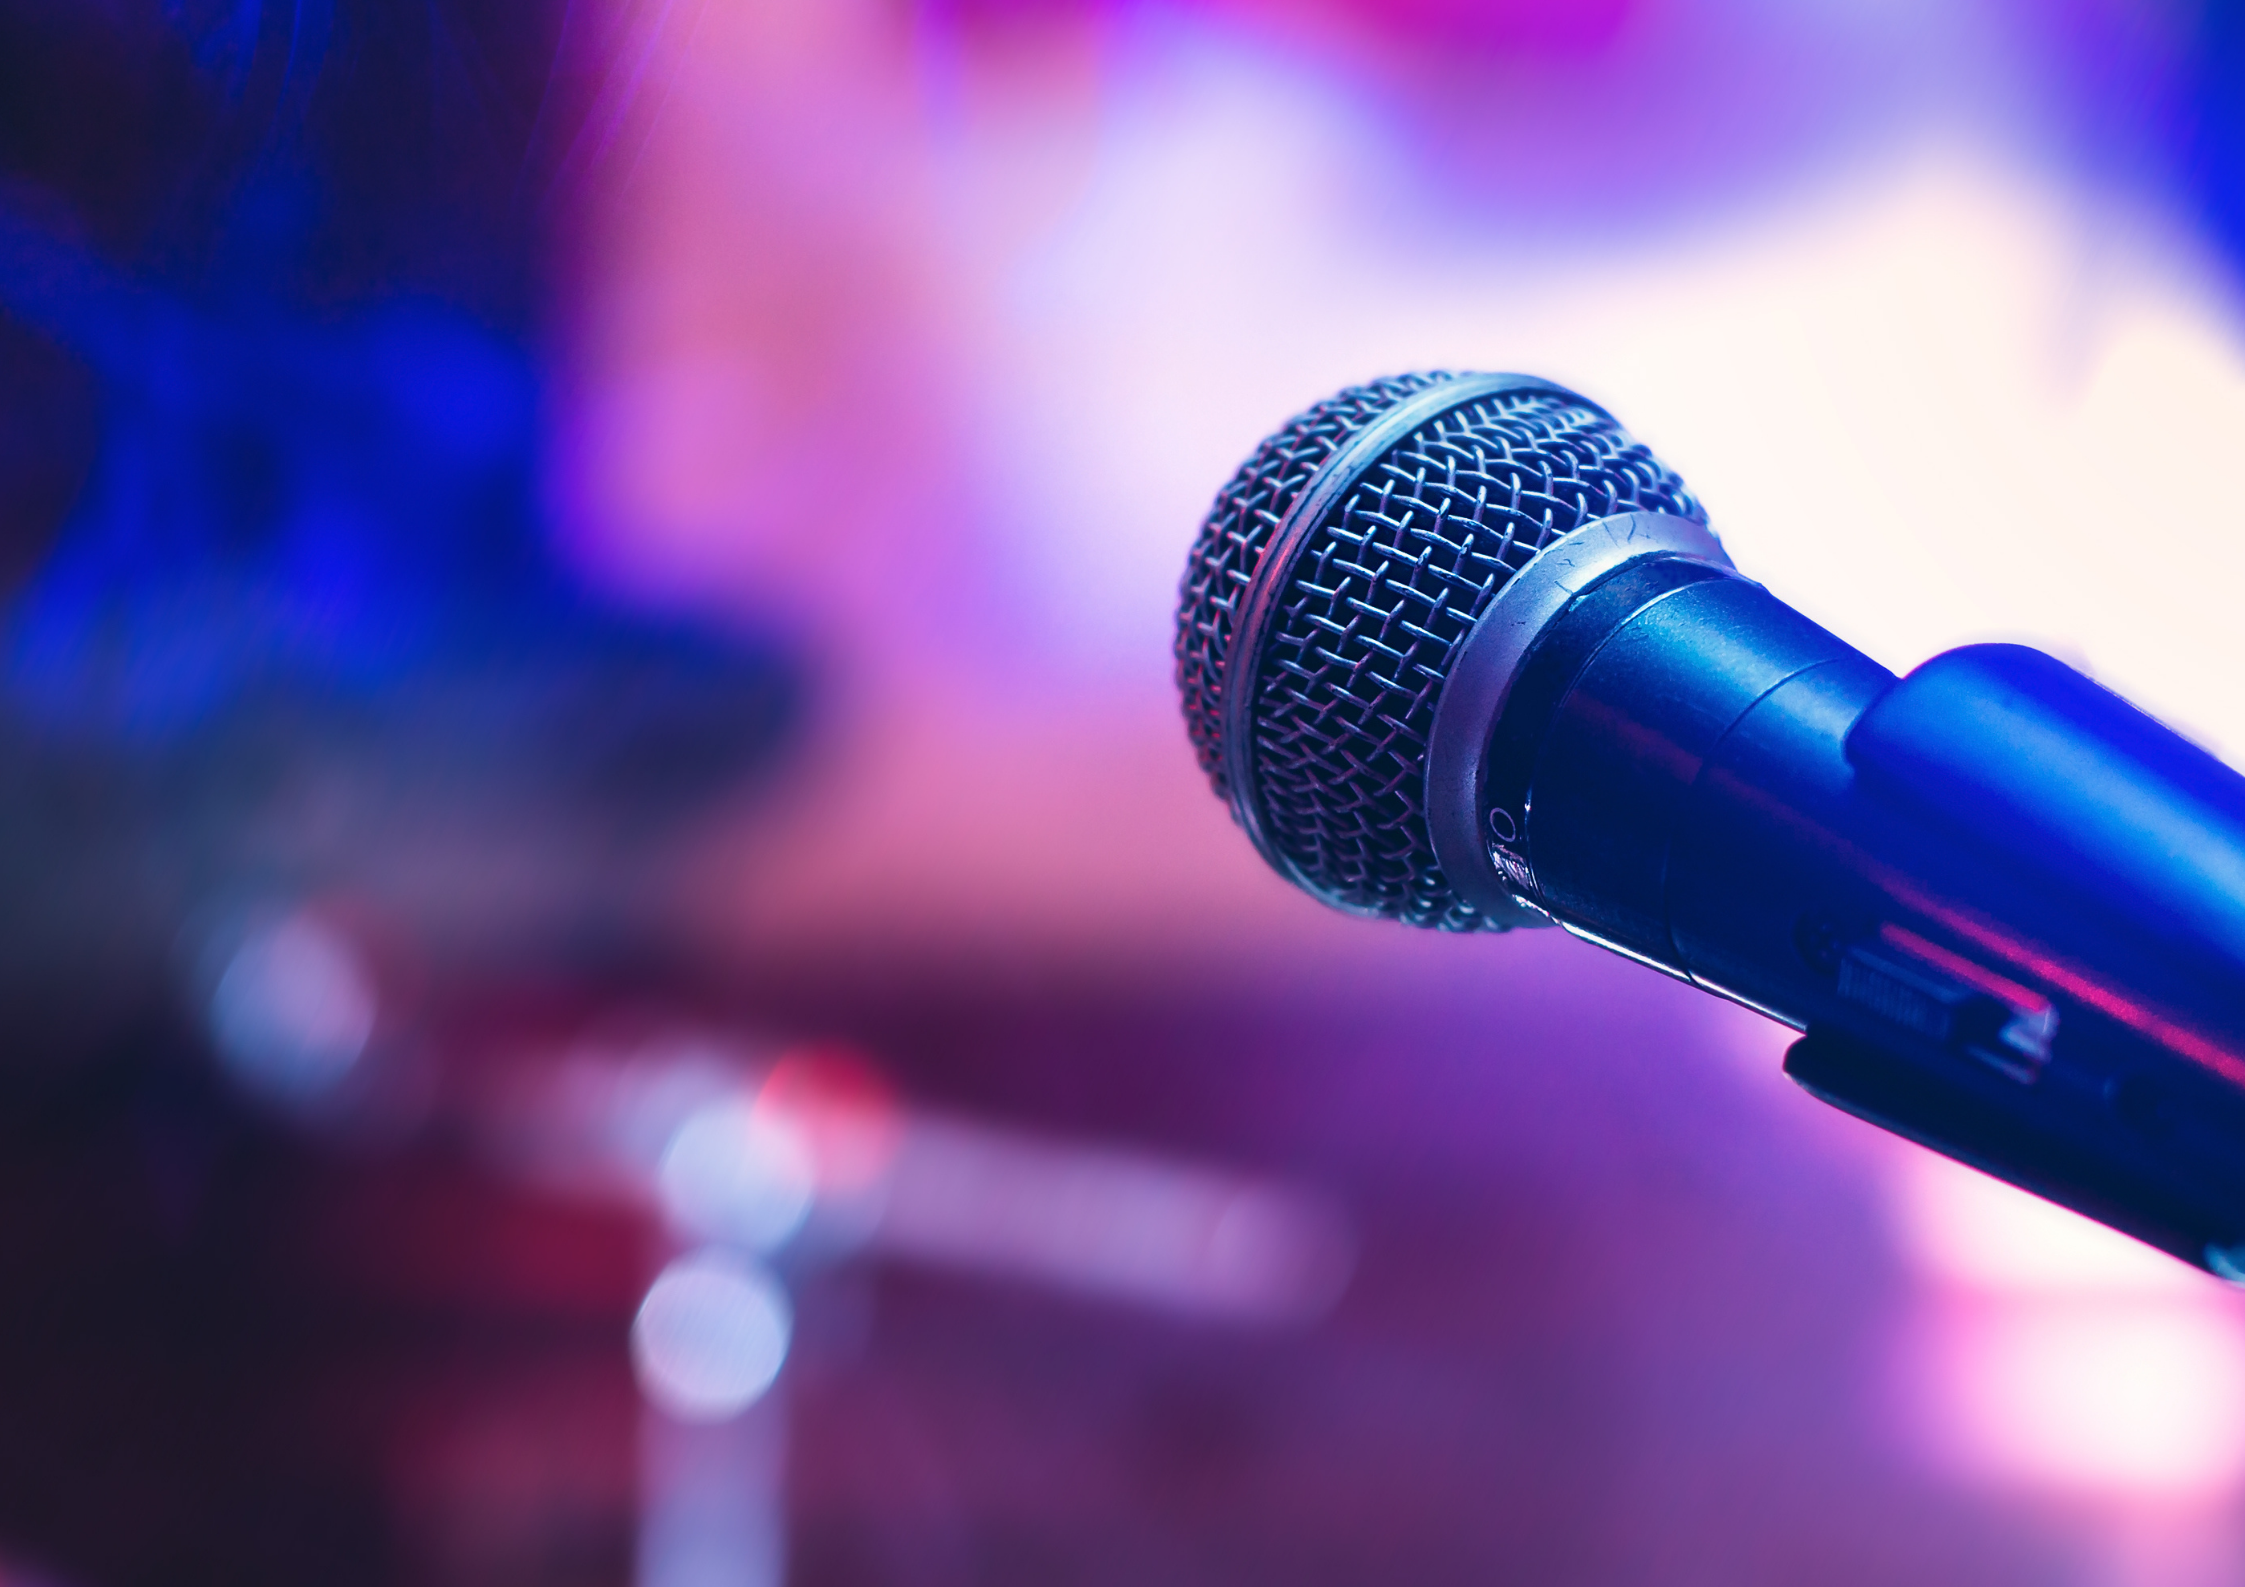 Karaokelaulun kurssi